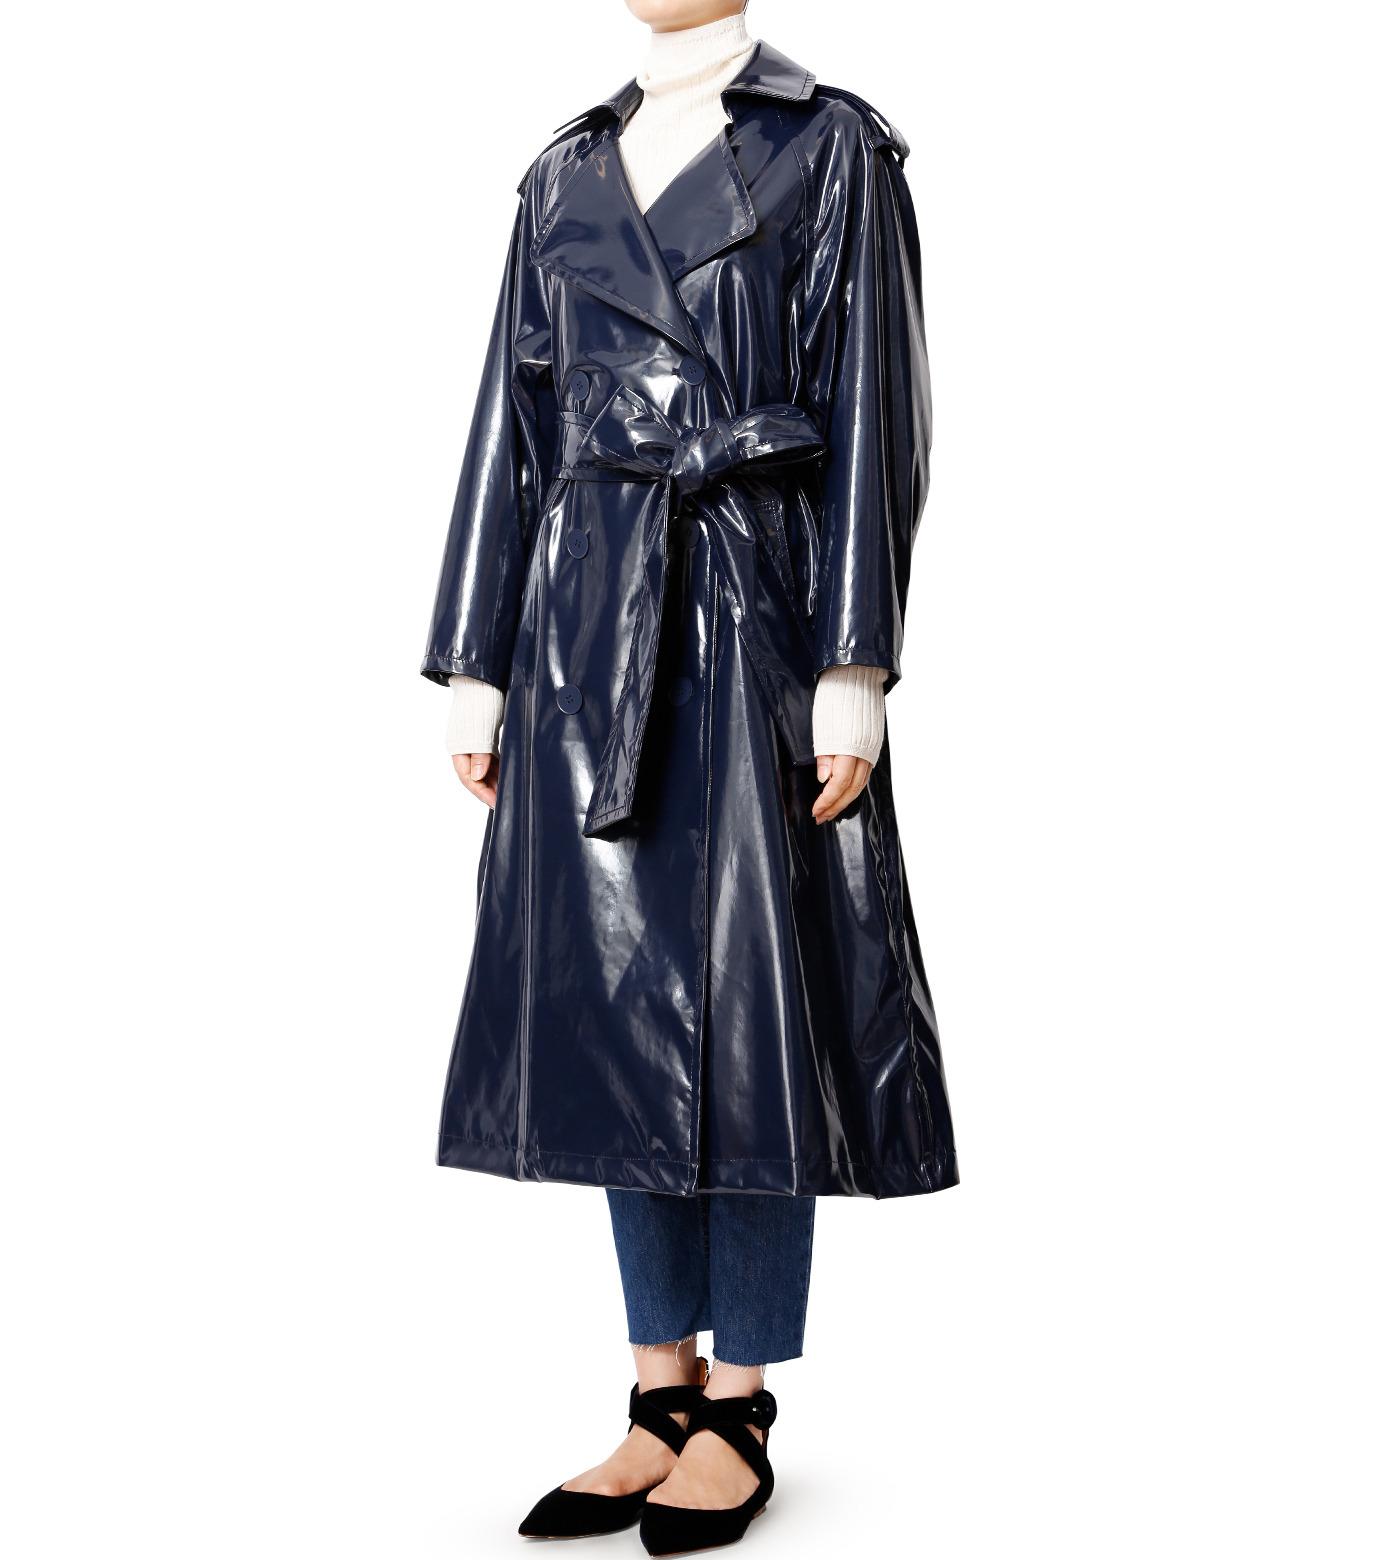 LE CIEL BLEU(ルシェルブルー)のフェイクエナメルレディトレンチコート-NAVY(コート/coat)-18A69408 拡大詳細画像1